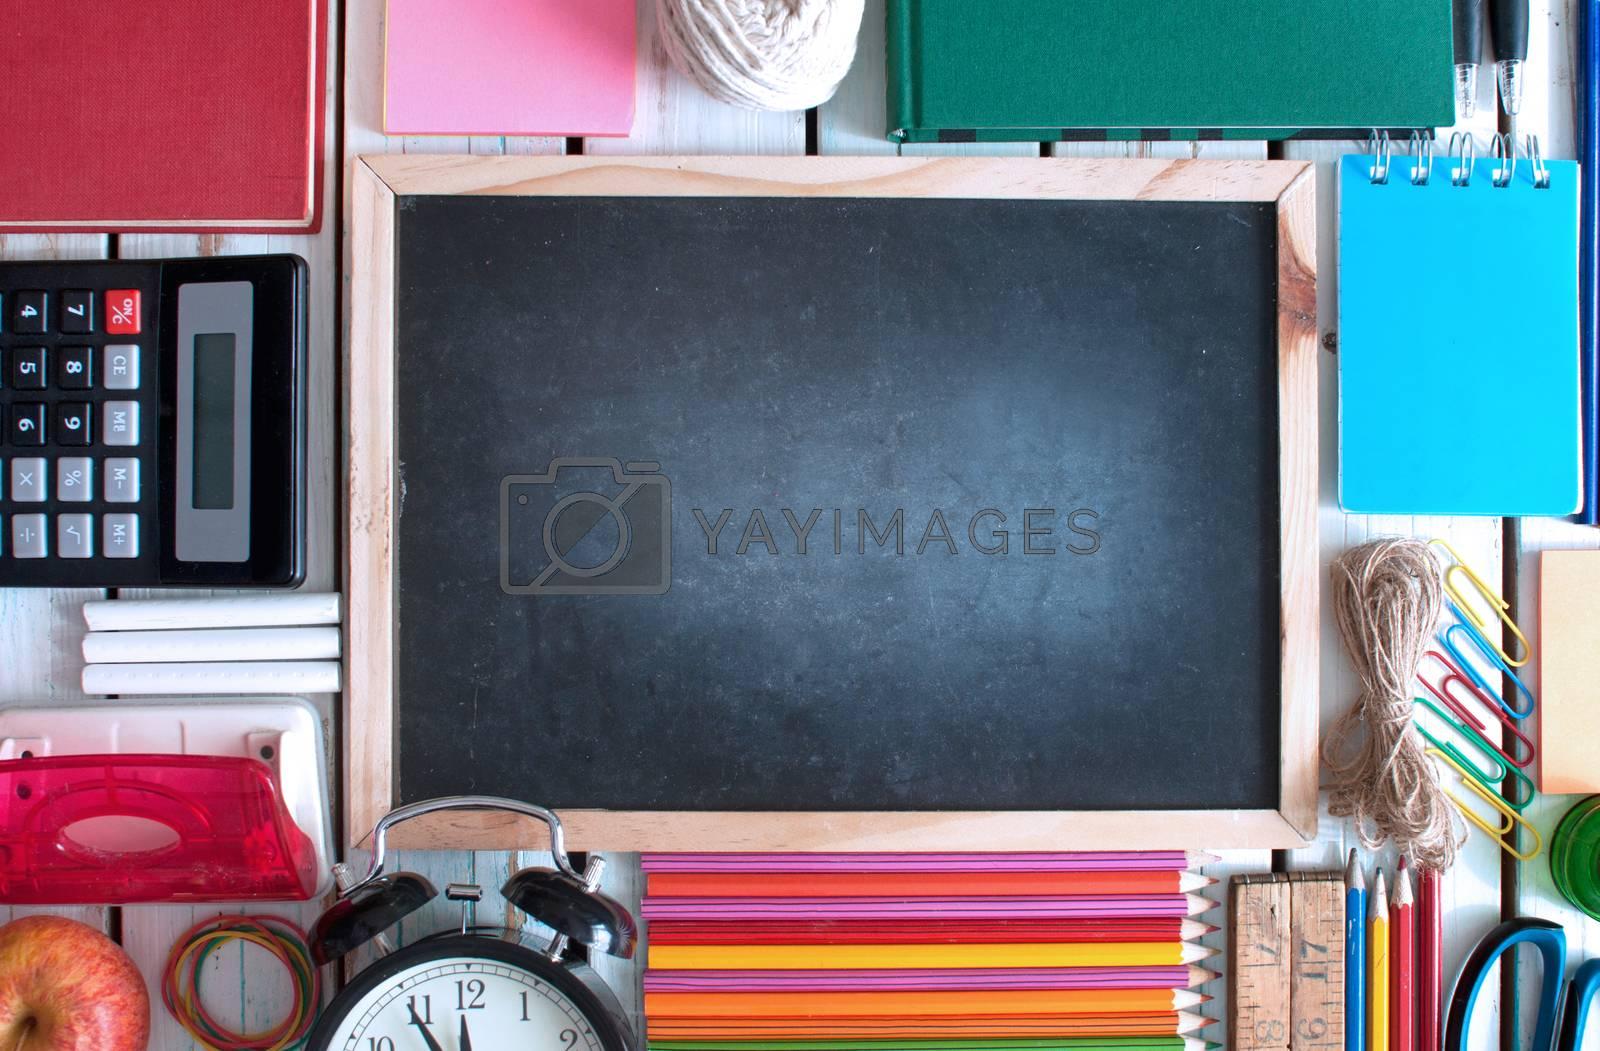 Royalty free image of Blackboard background by unikpix